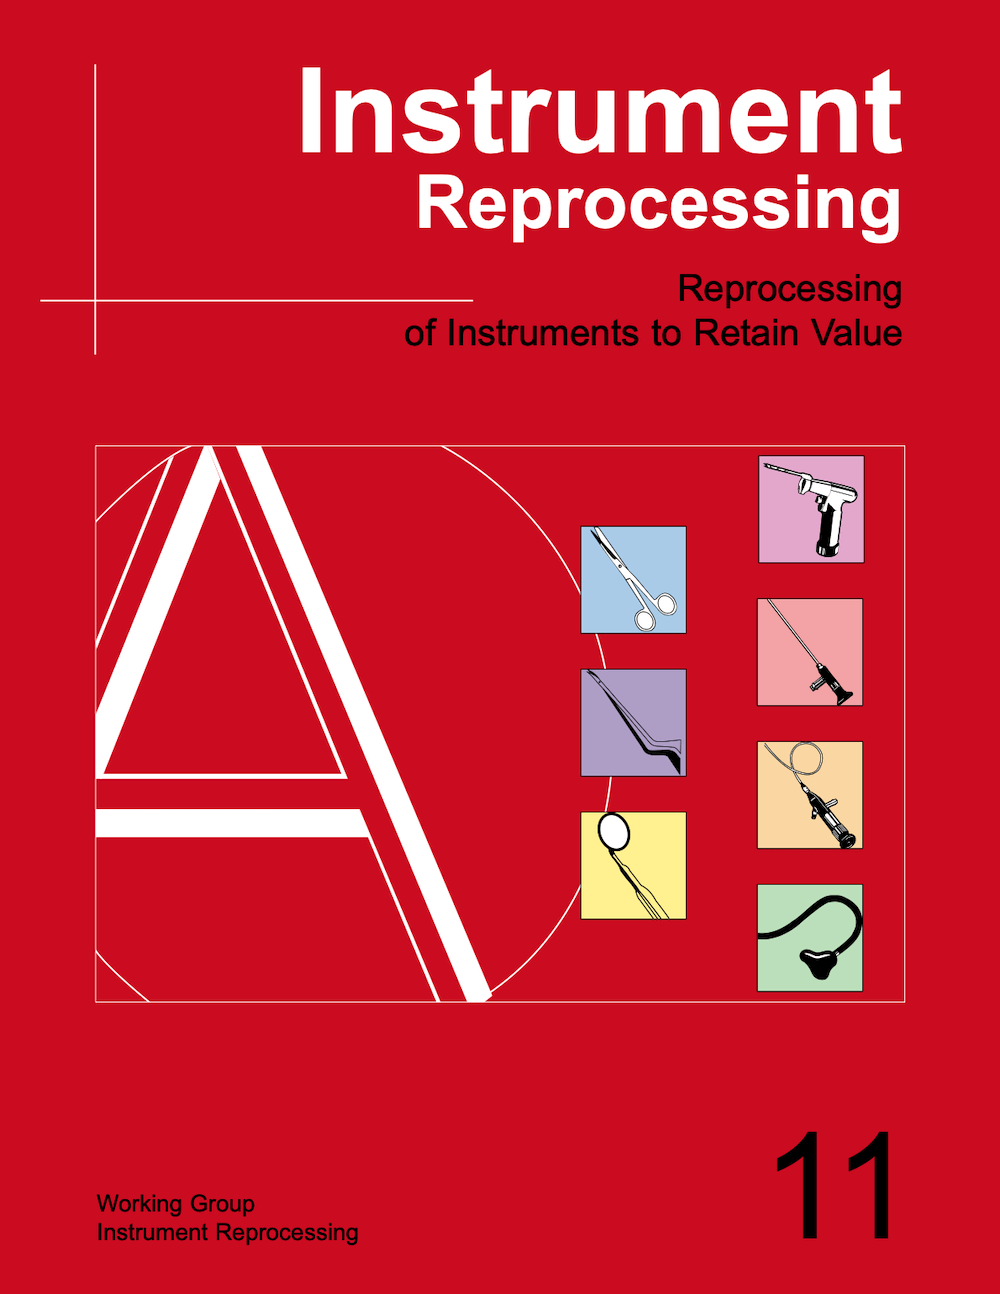 Instrument-Reprocessing-11-1